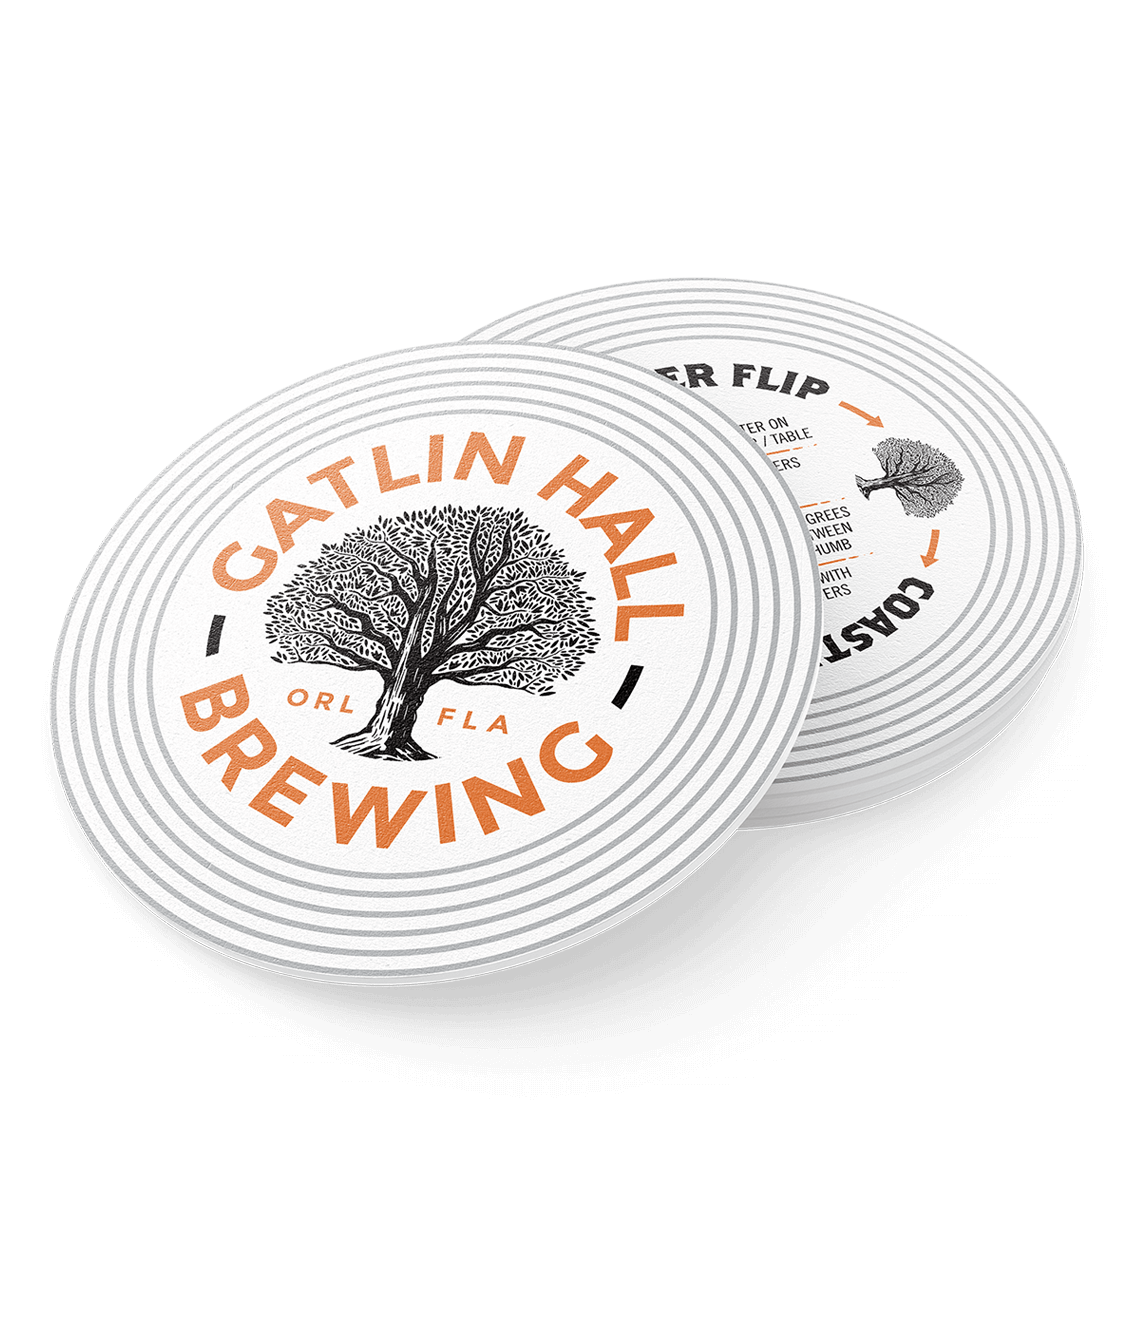 Round coaster for Gatlin Hall